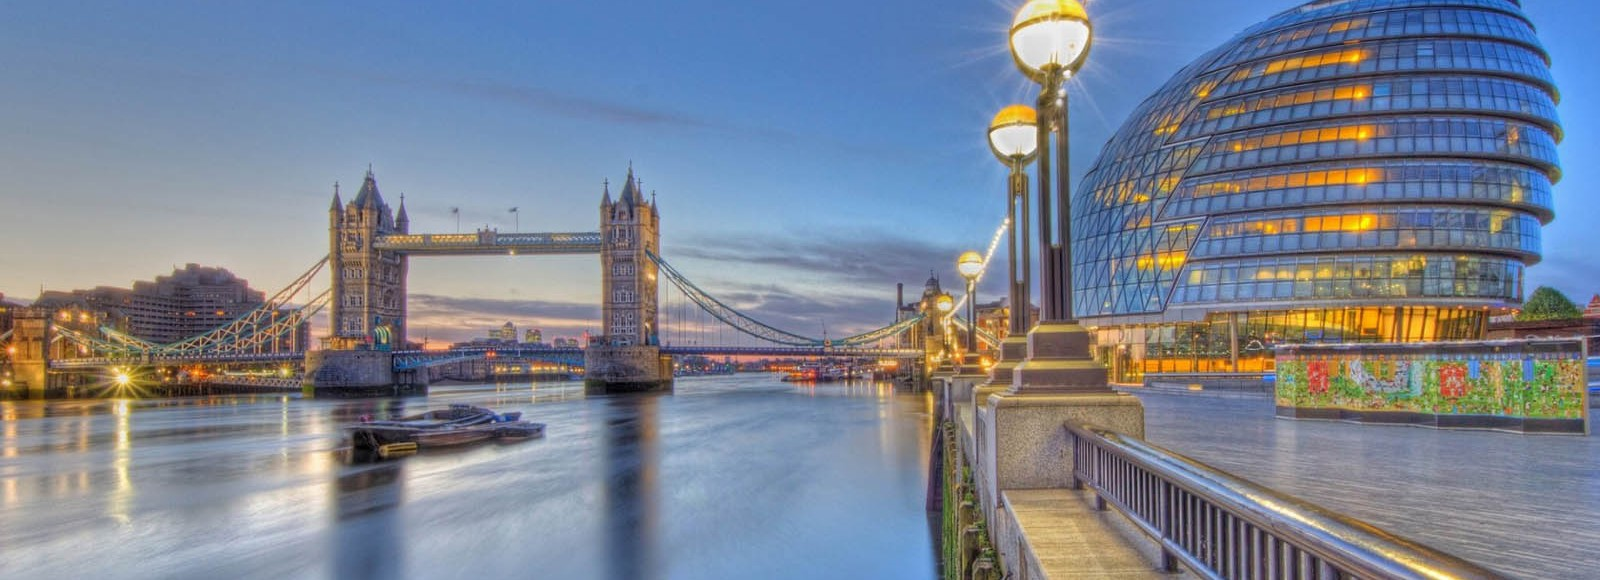 london-city-40-high-resolution-wallpaper